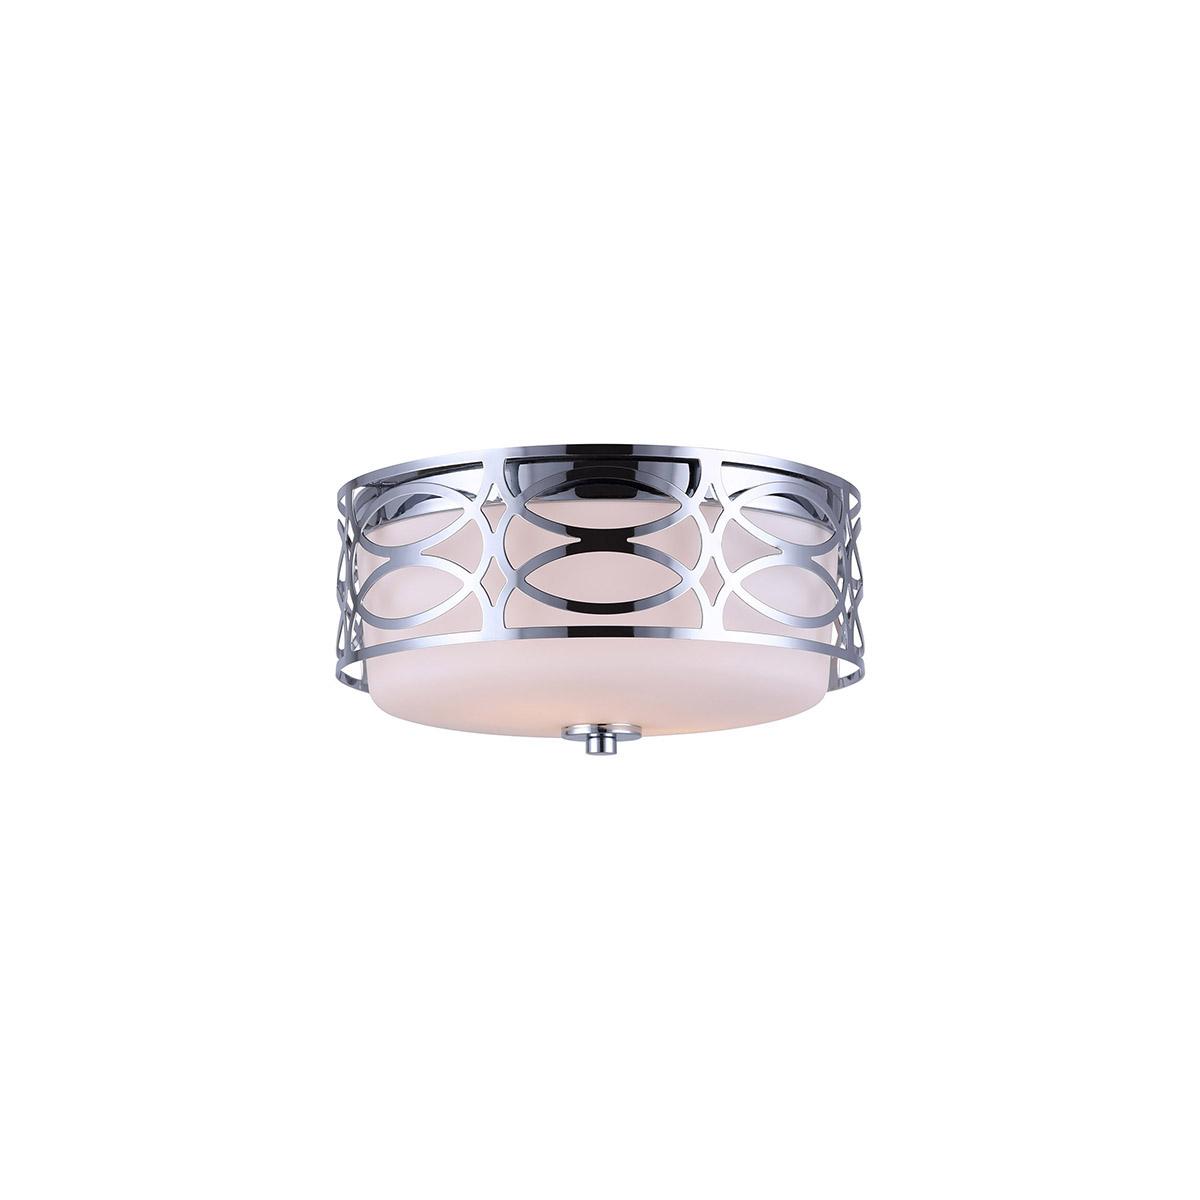 Flush mounts 2 light fixtures with chrome finish steel glass a bulb 12 120 watts